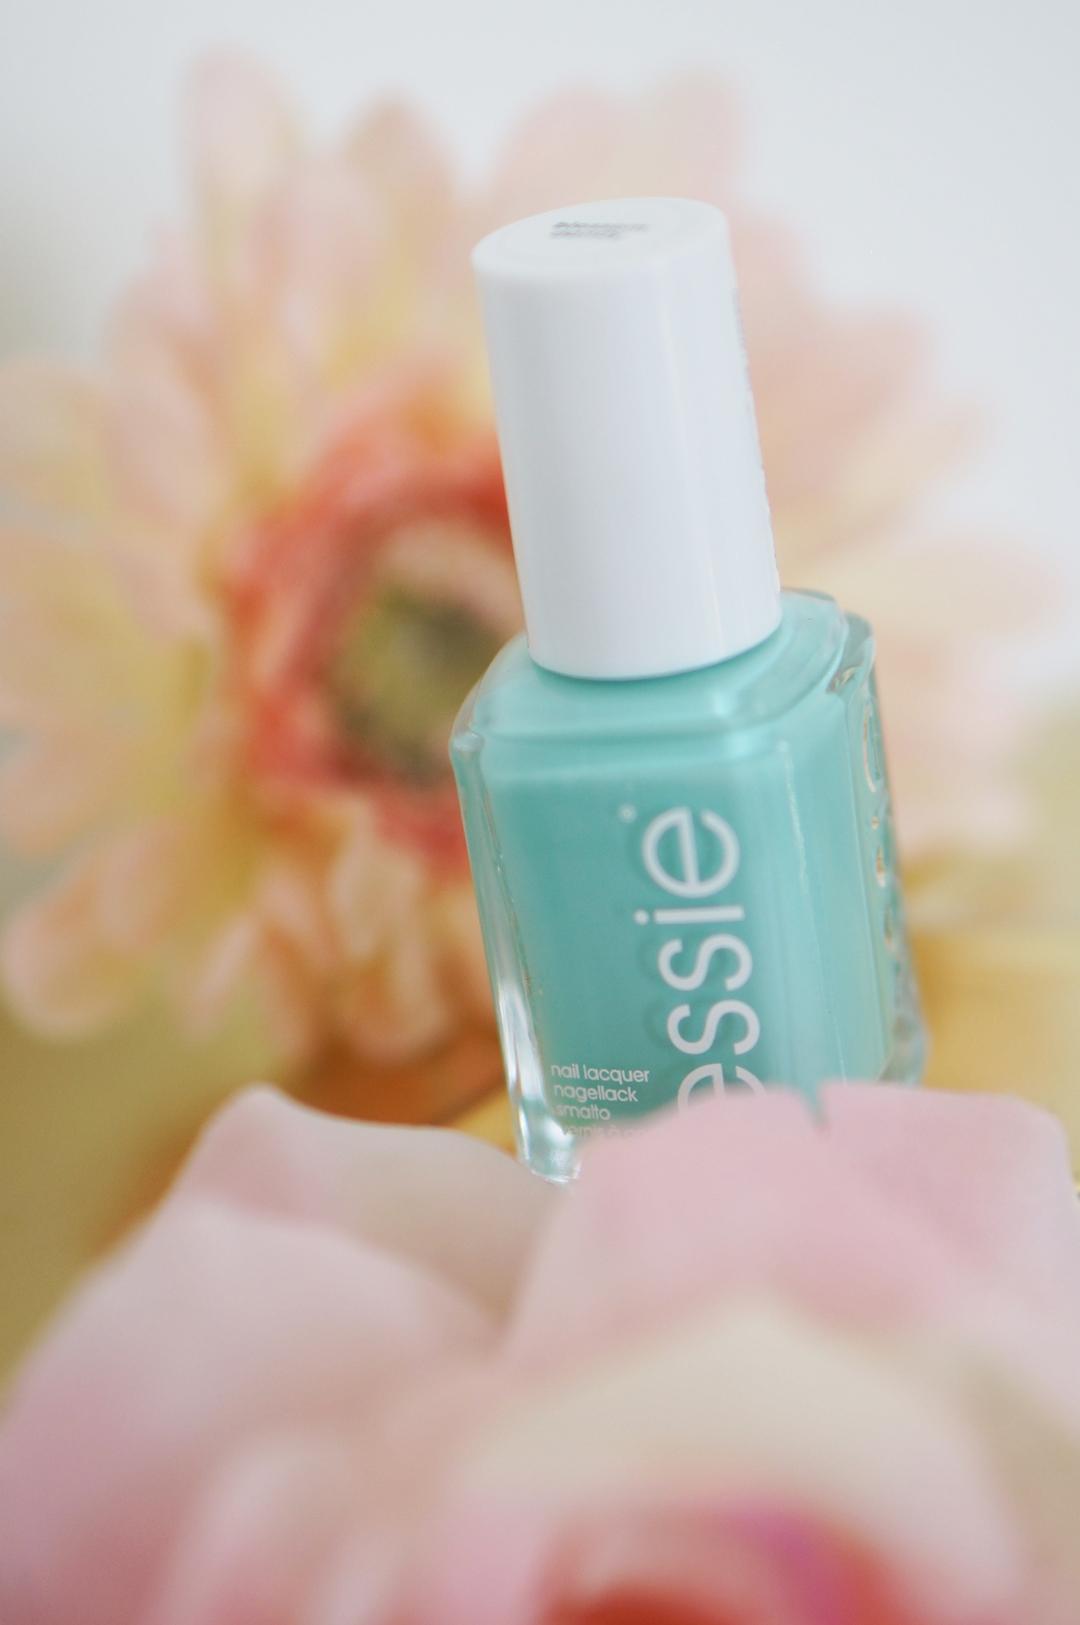 Essie-flowerista-perennial-chic-blossom-dandy--swatches-beautyill (1)